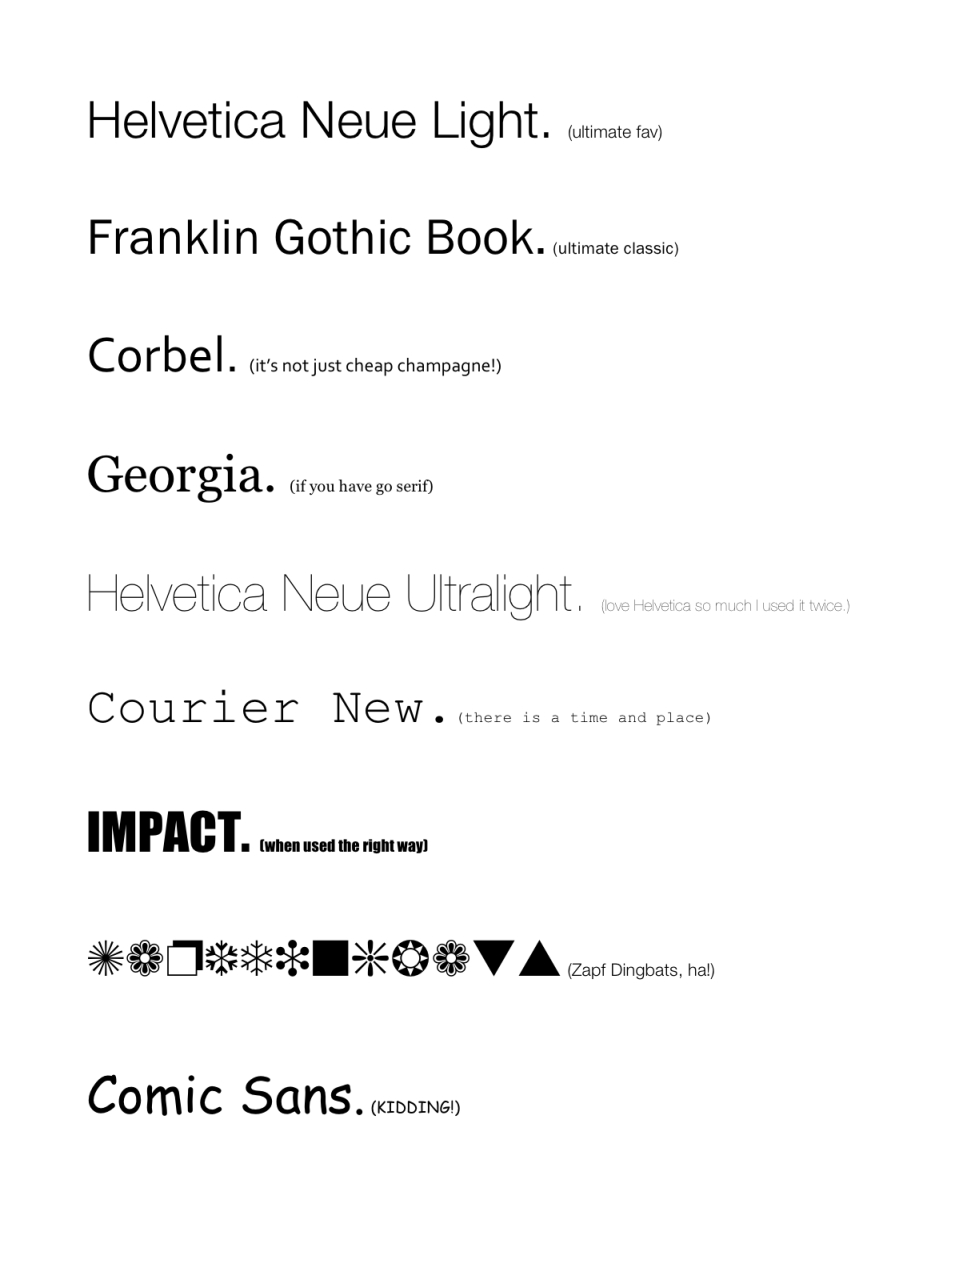 kates fonts